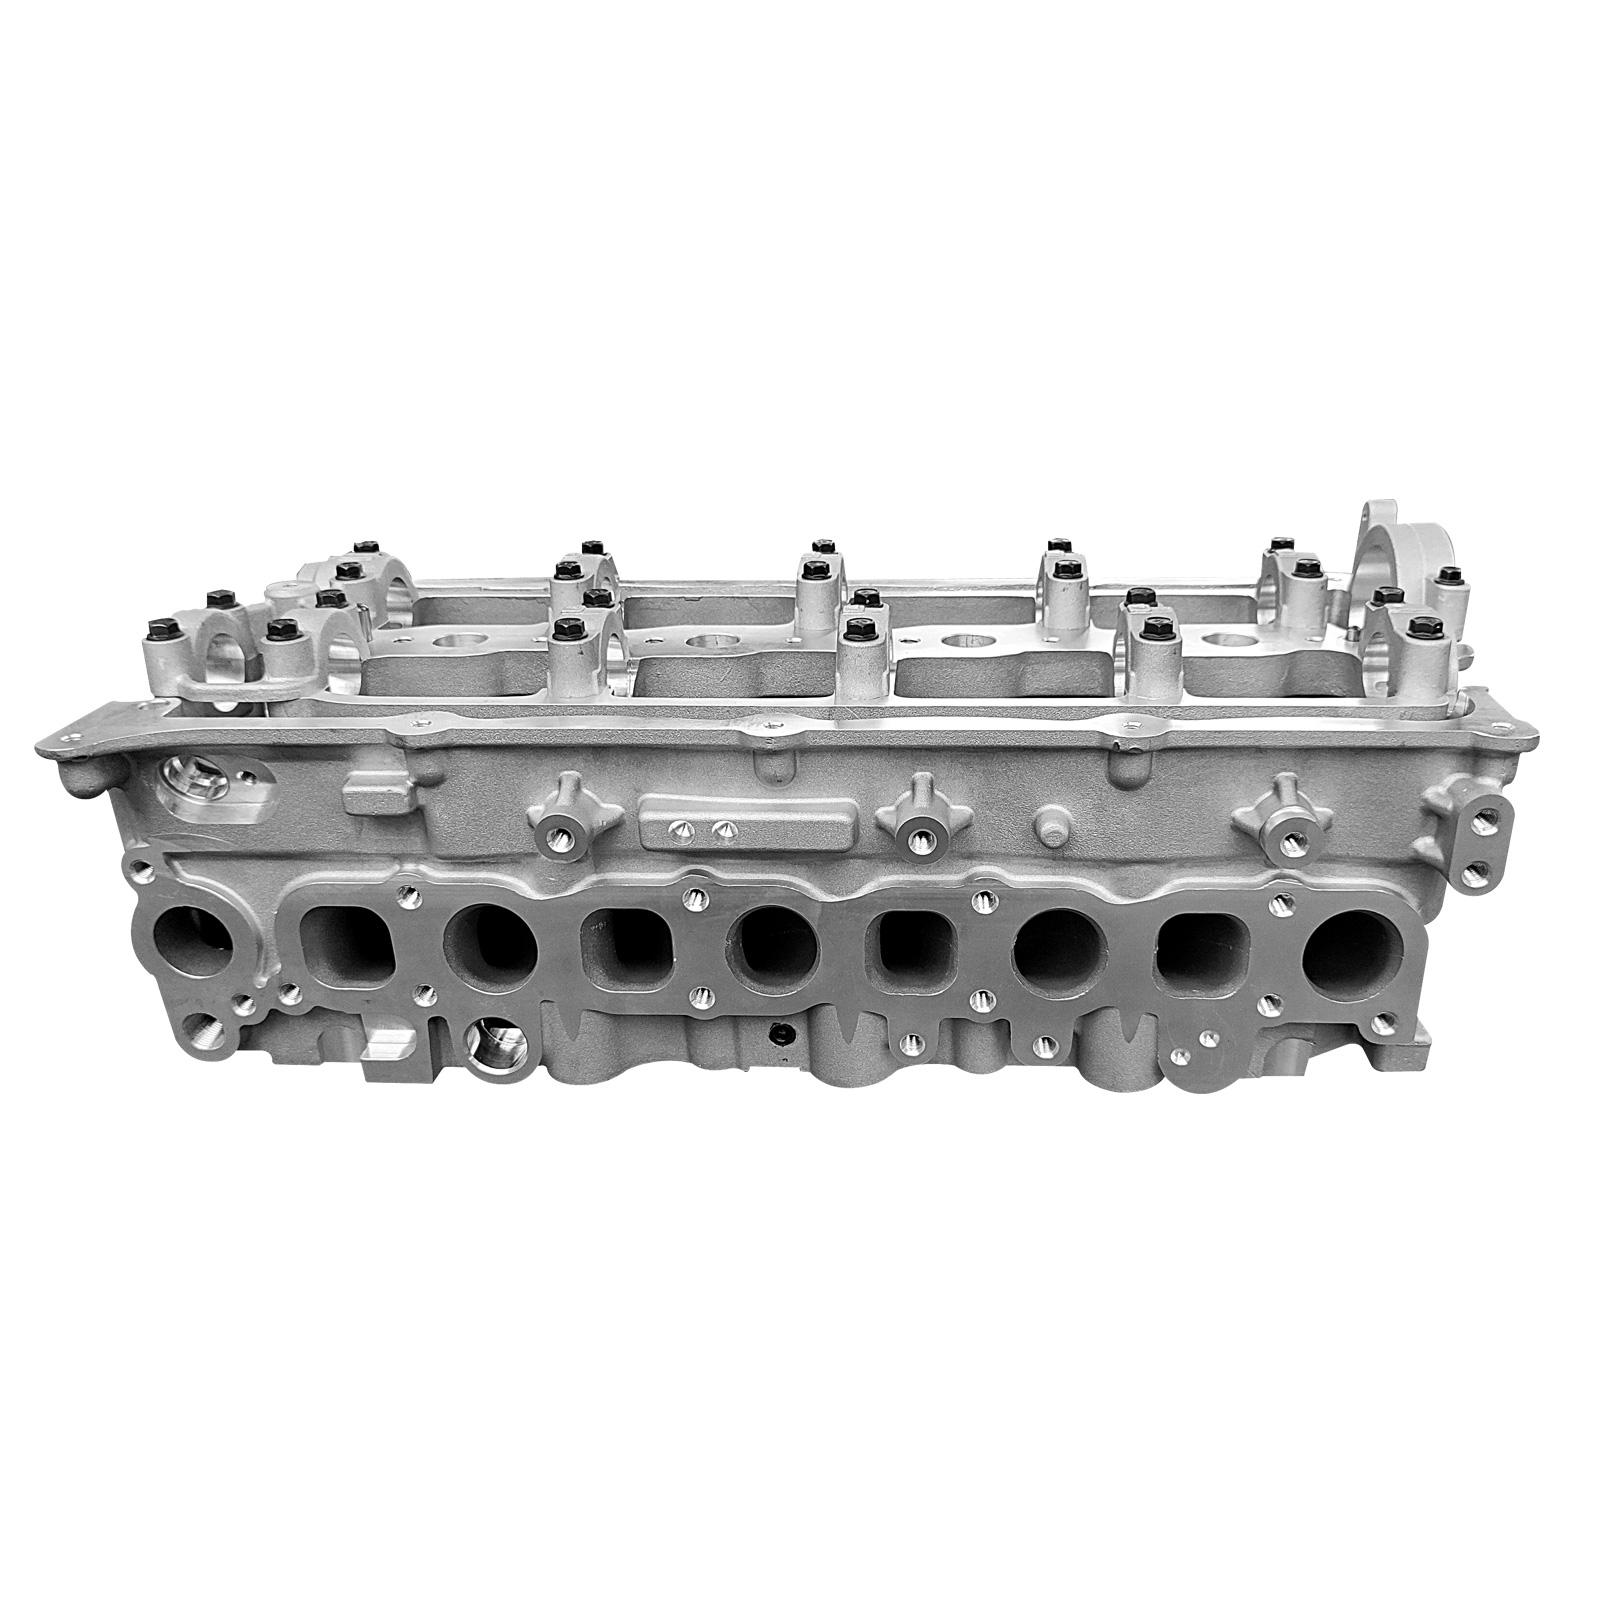 Cabeçote Hyundai HR 2.5 16v Diesel Euro V Motor D4CB Ano 2012 a 2020